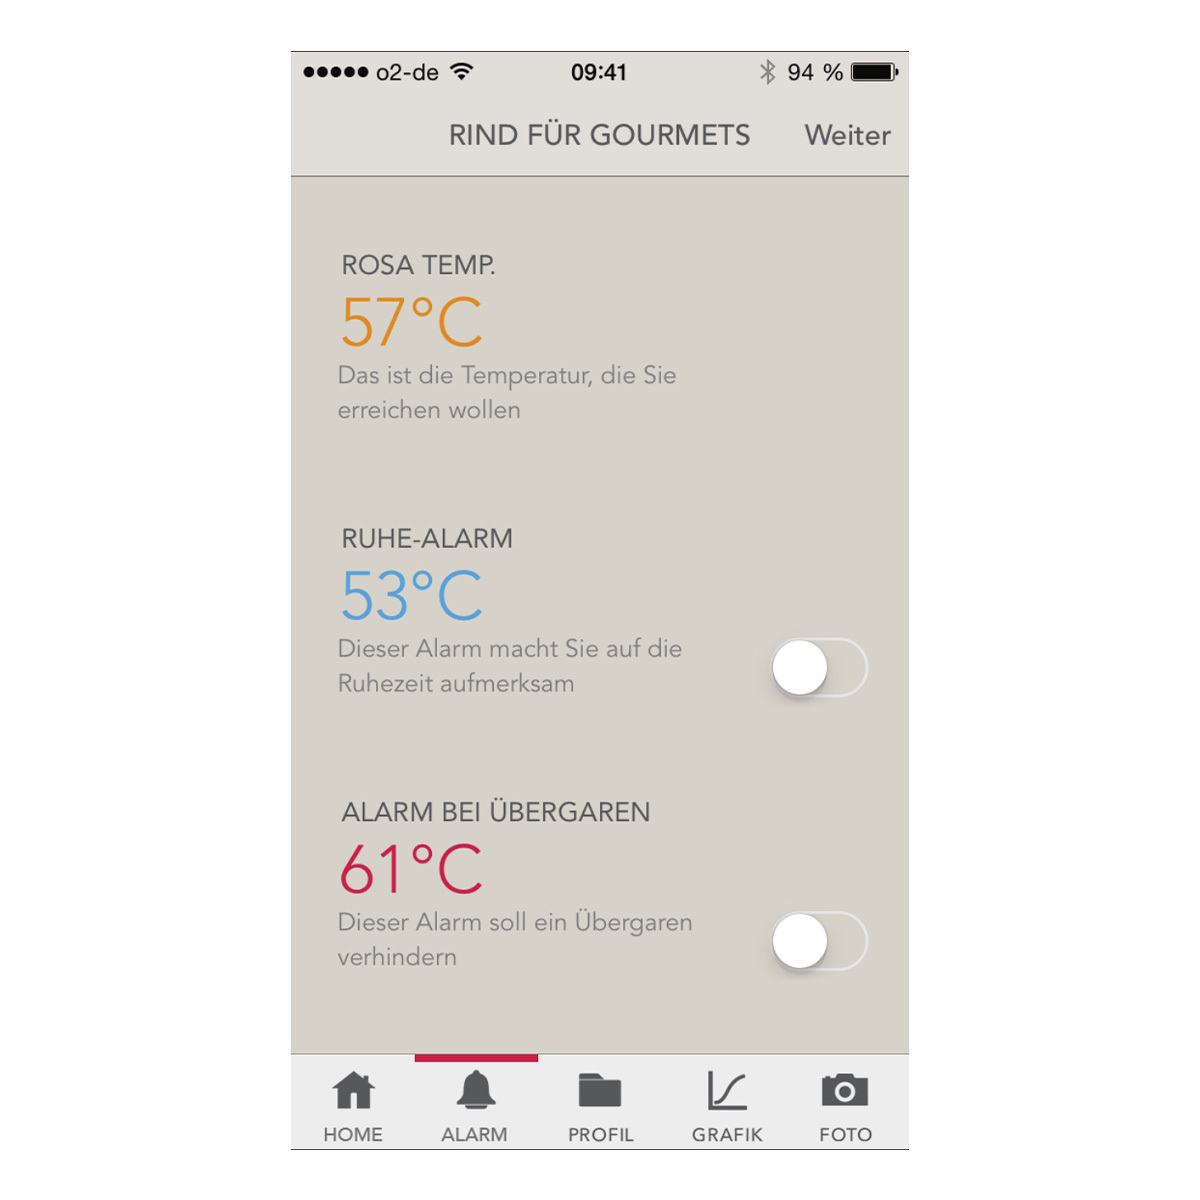 14-1505-01-gourmet-thermometer-für-smartphones-thermowire-app-anwendung1-1200x1200px.jpg